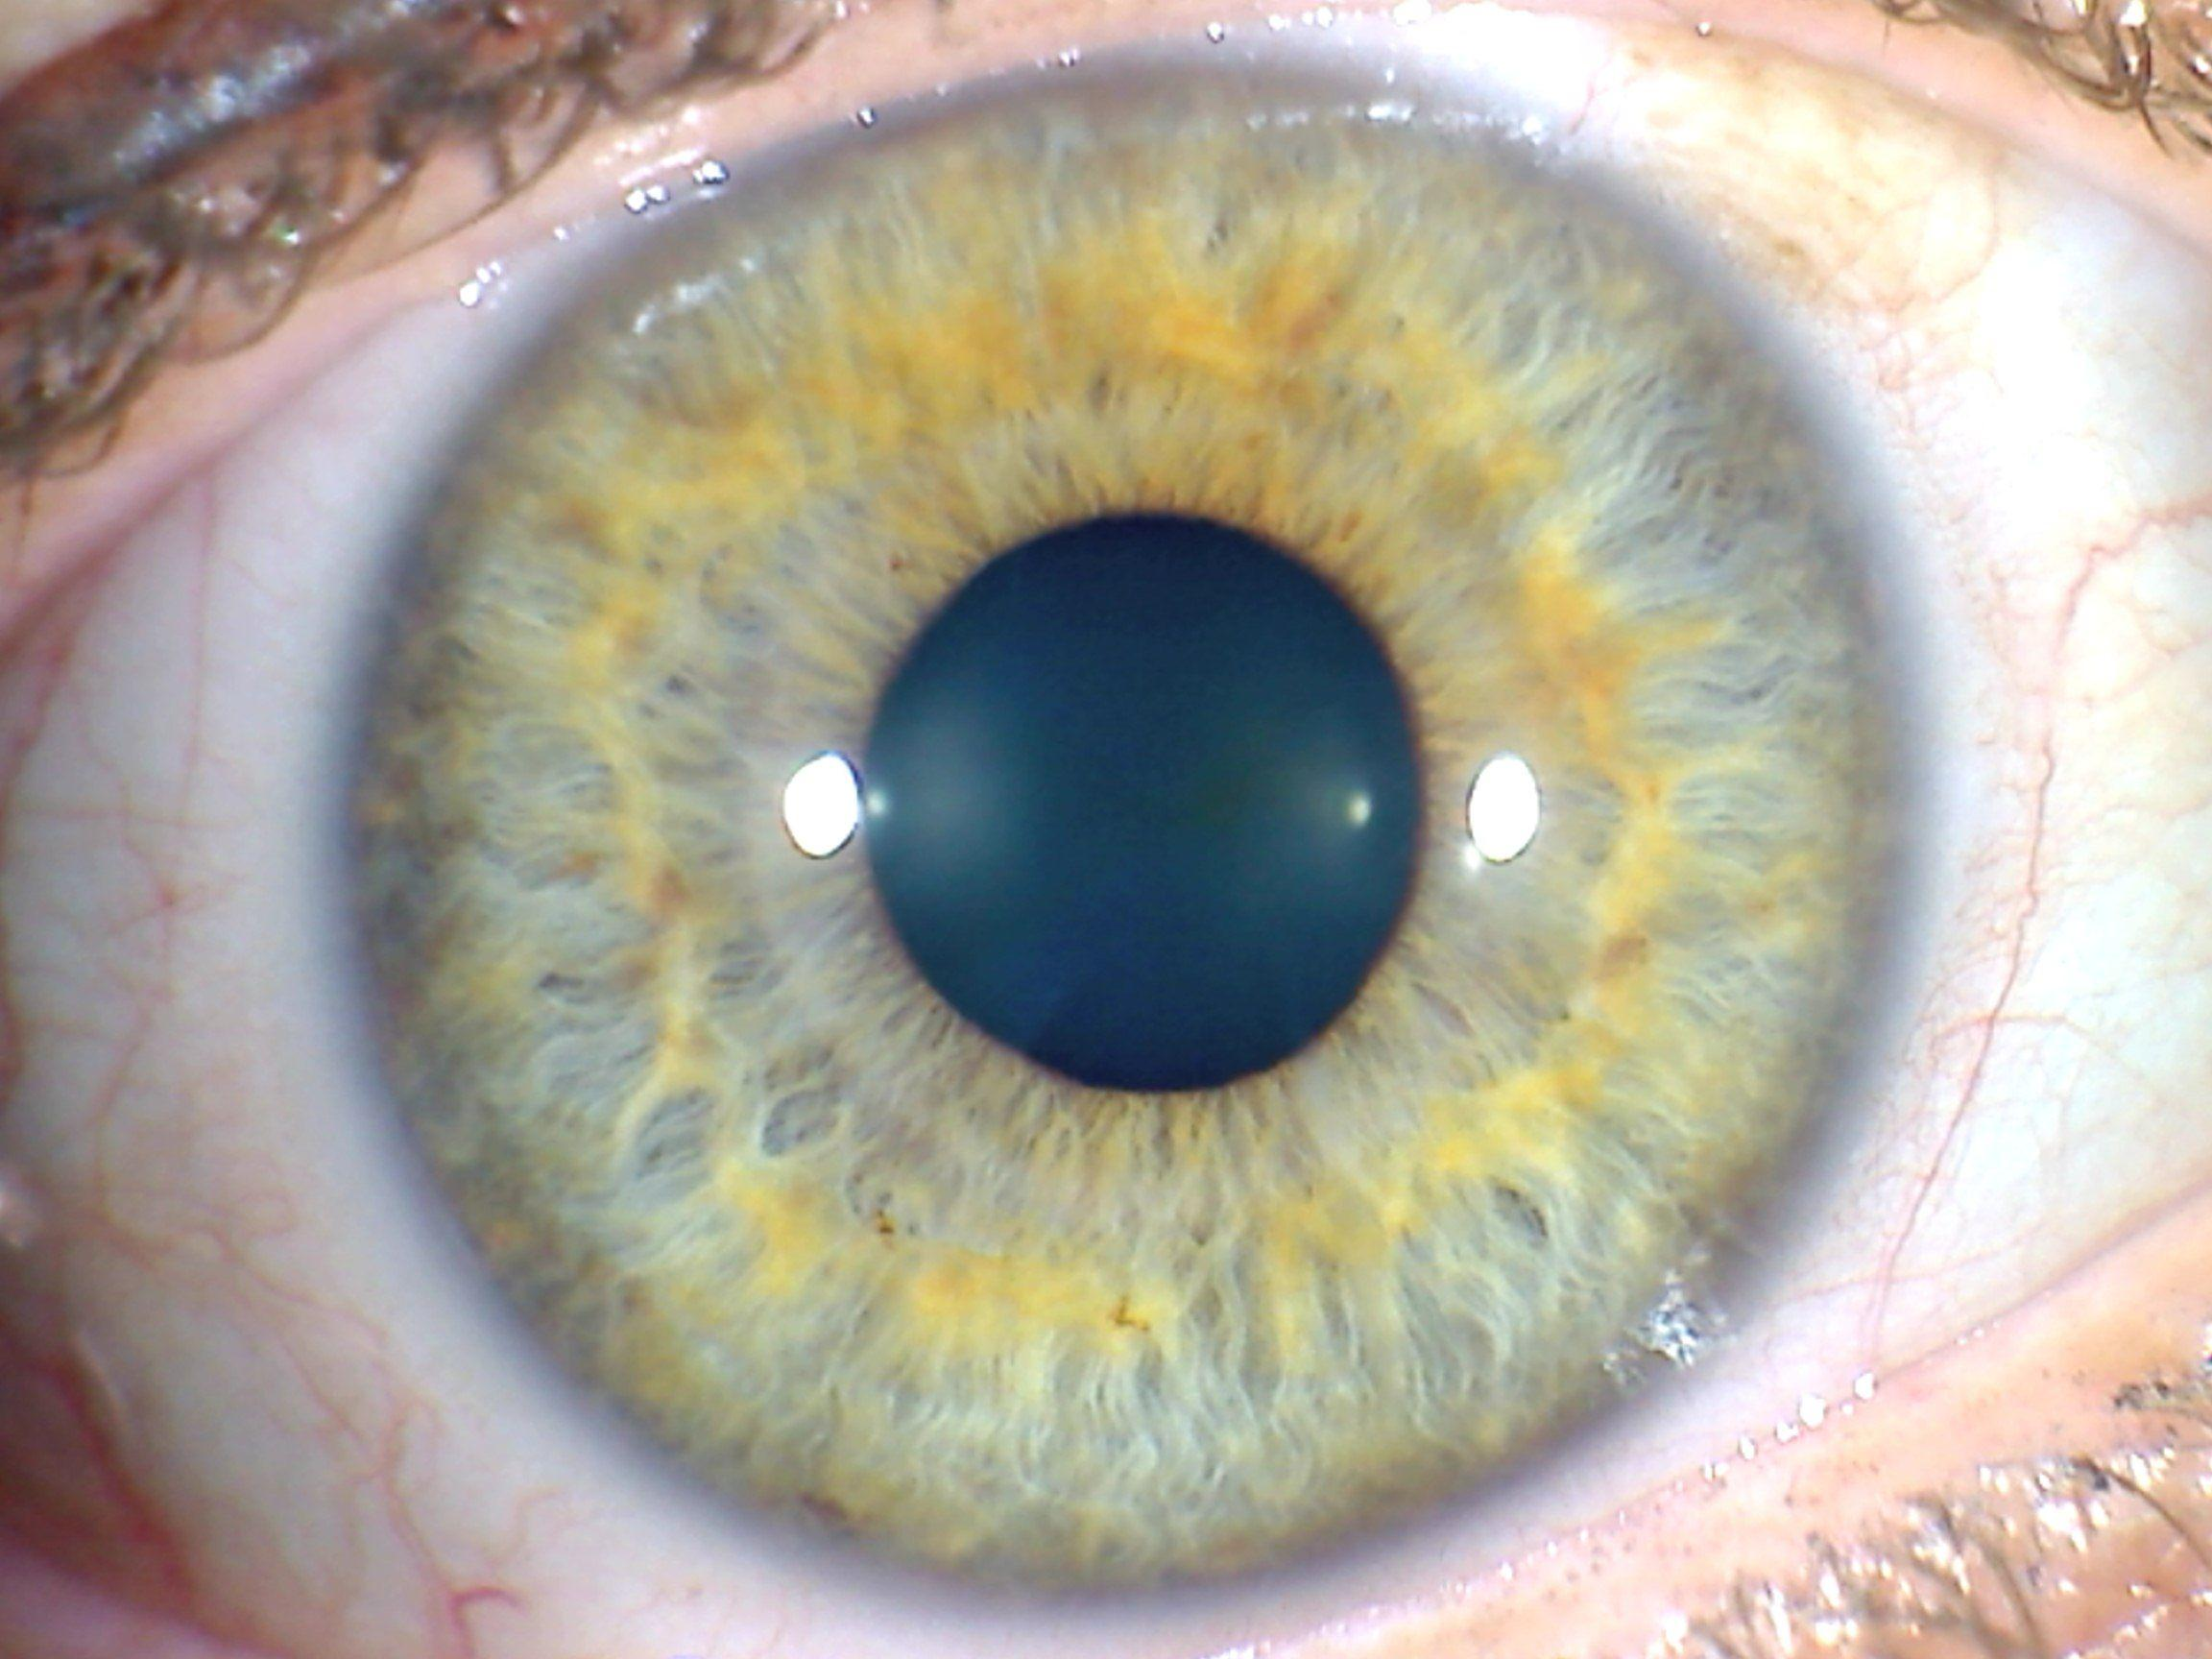 Medicina natural para los ojos